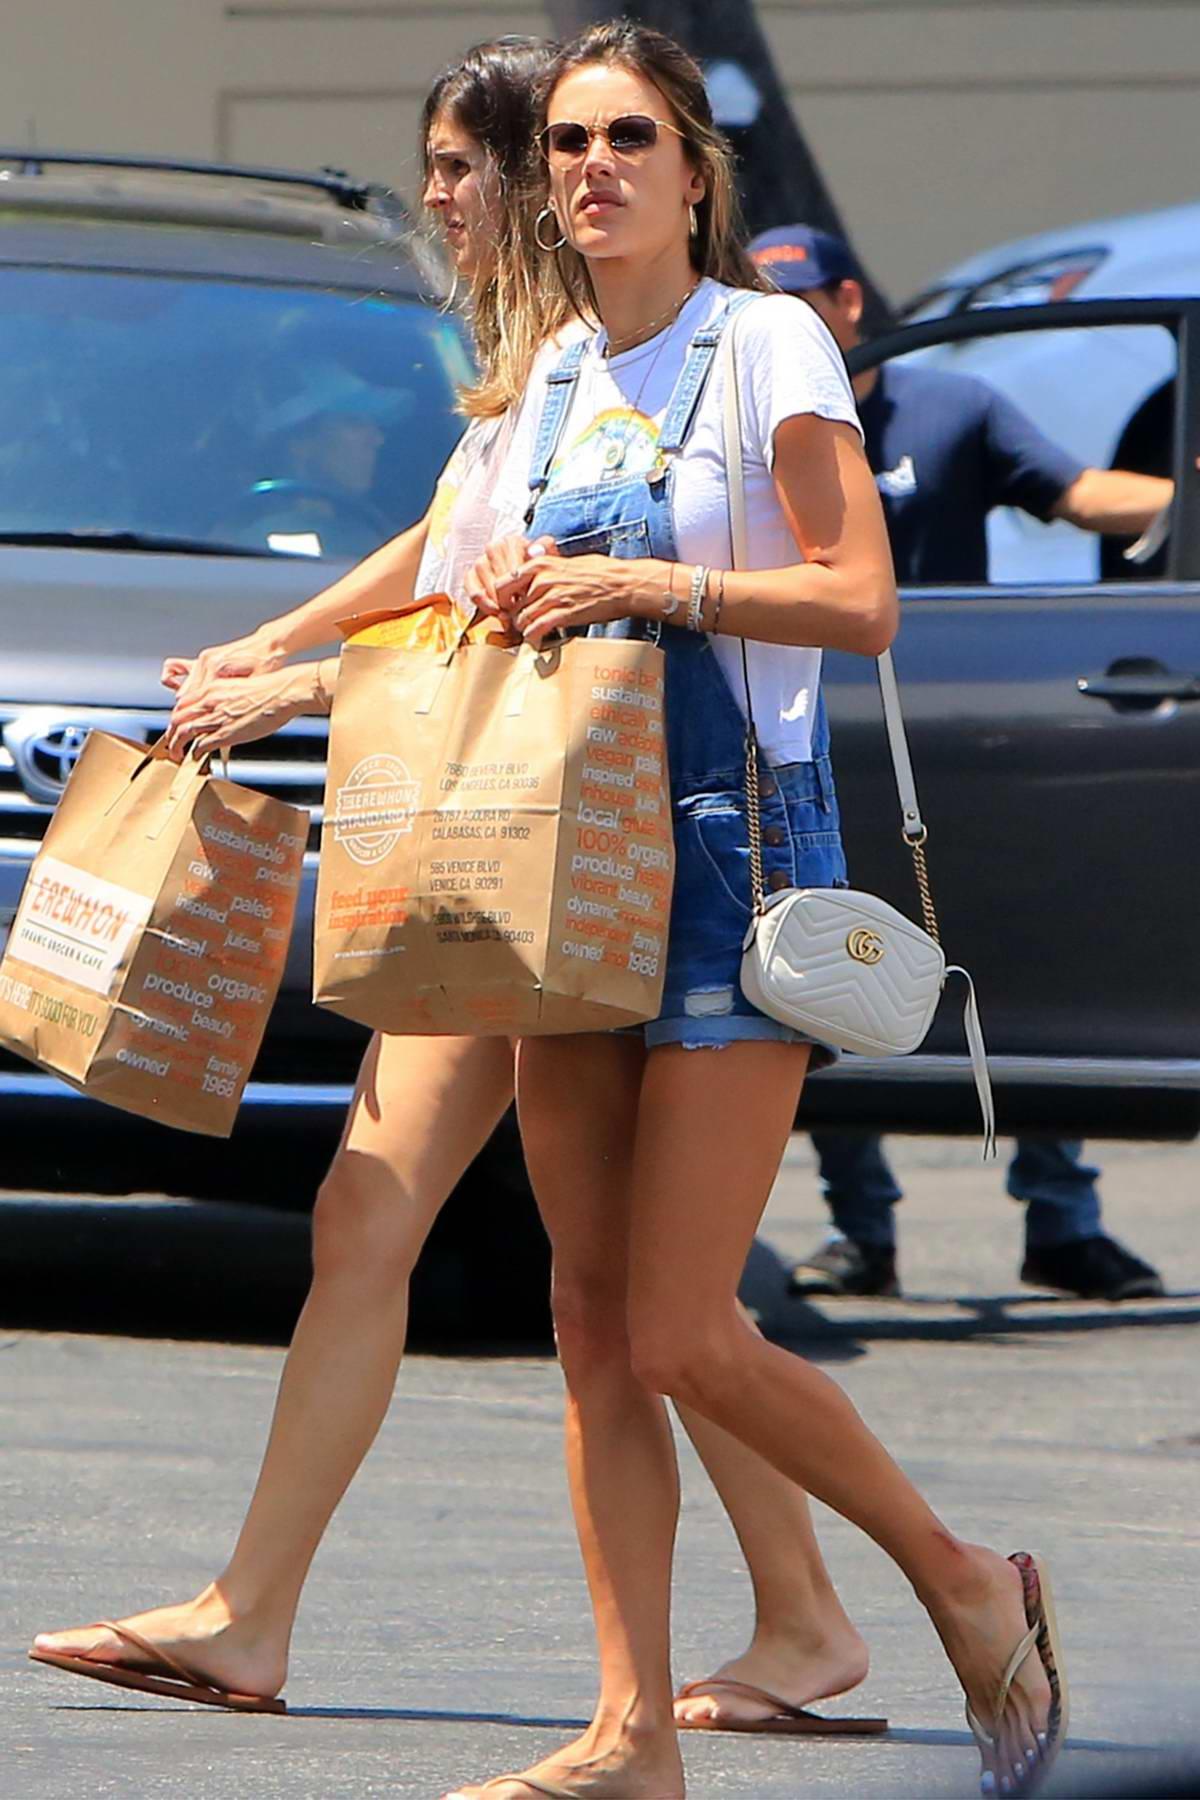 Alessandra Ambrosio seen running errands through the day in Santa Monica, Los Angeles